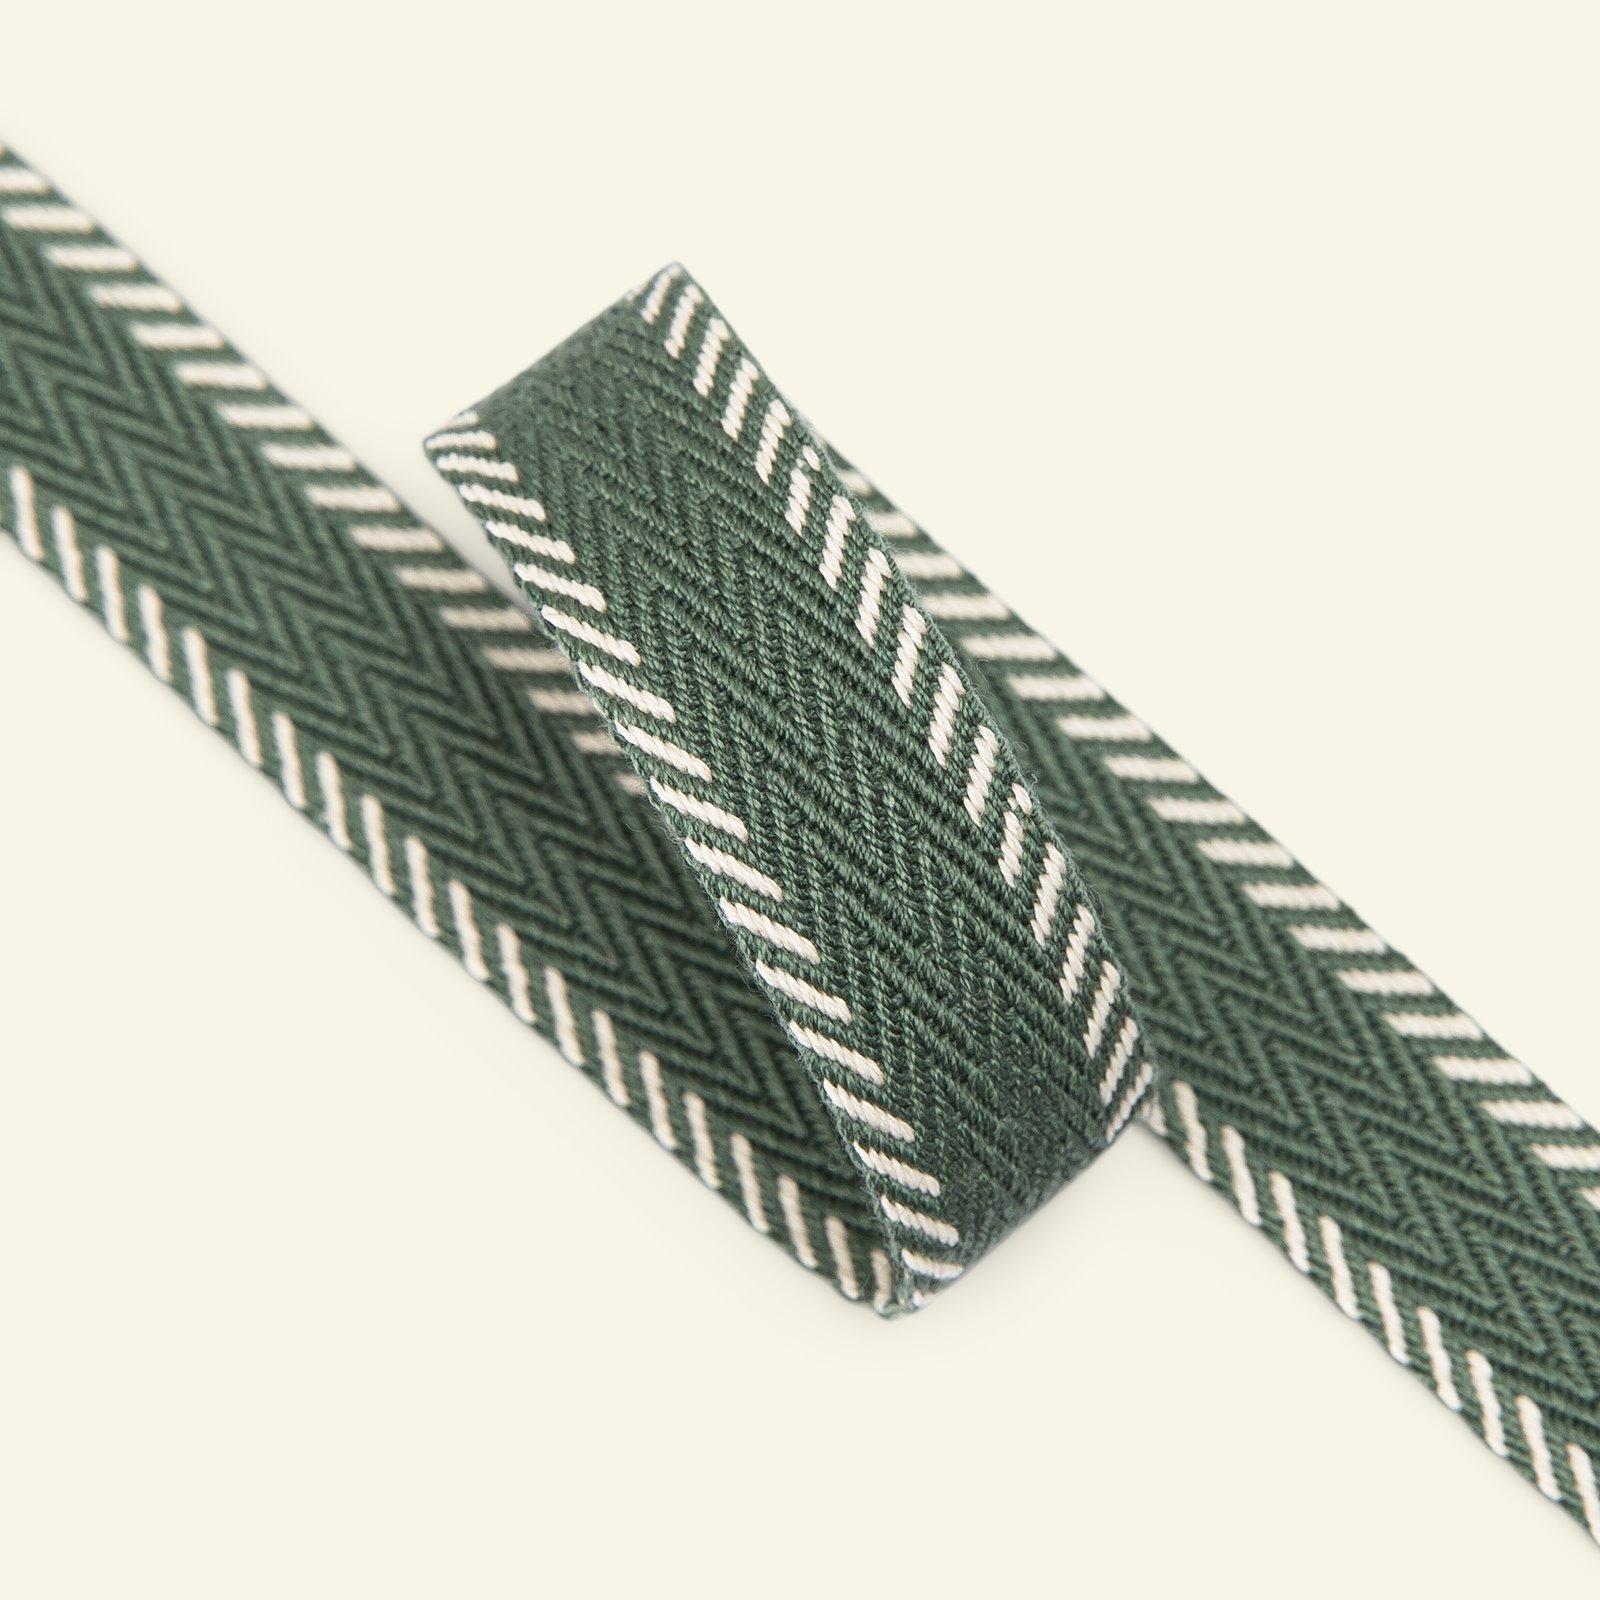 Gurtband 20mm Grün, 2m 22222_pack